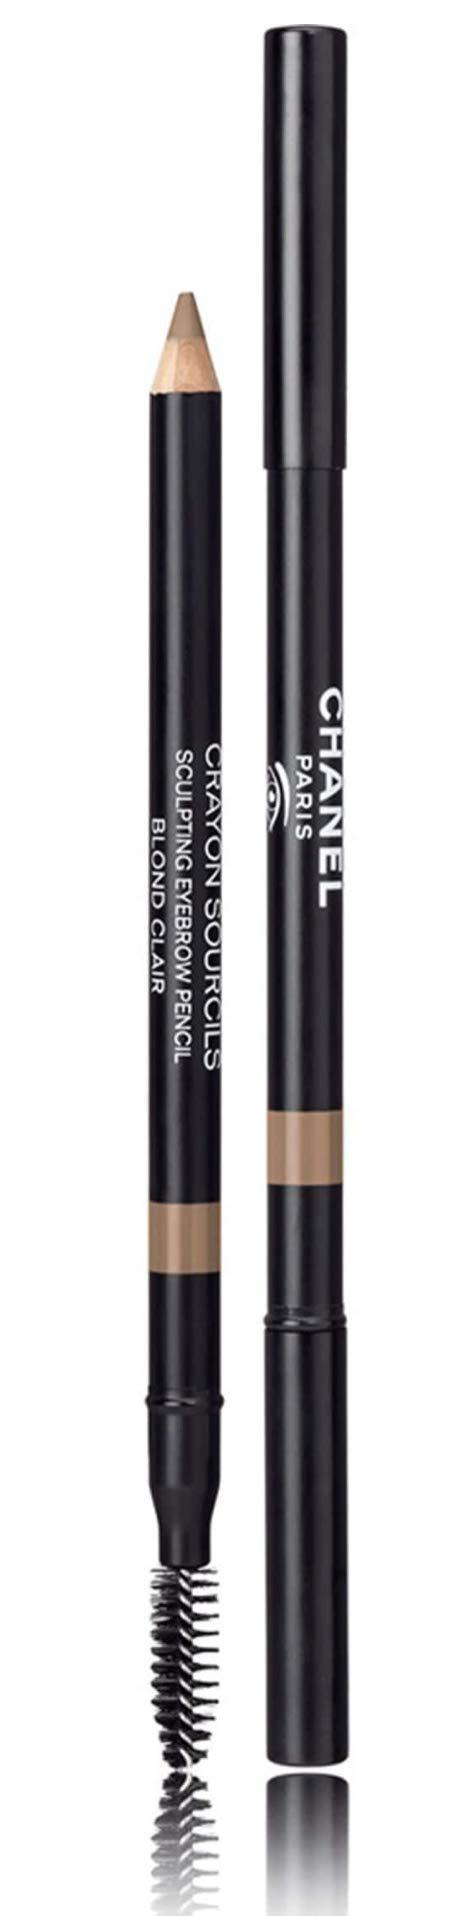 Crayon Sourcils Sculpting Eyebrow Pencil #10 Blond Clair